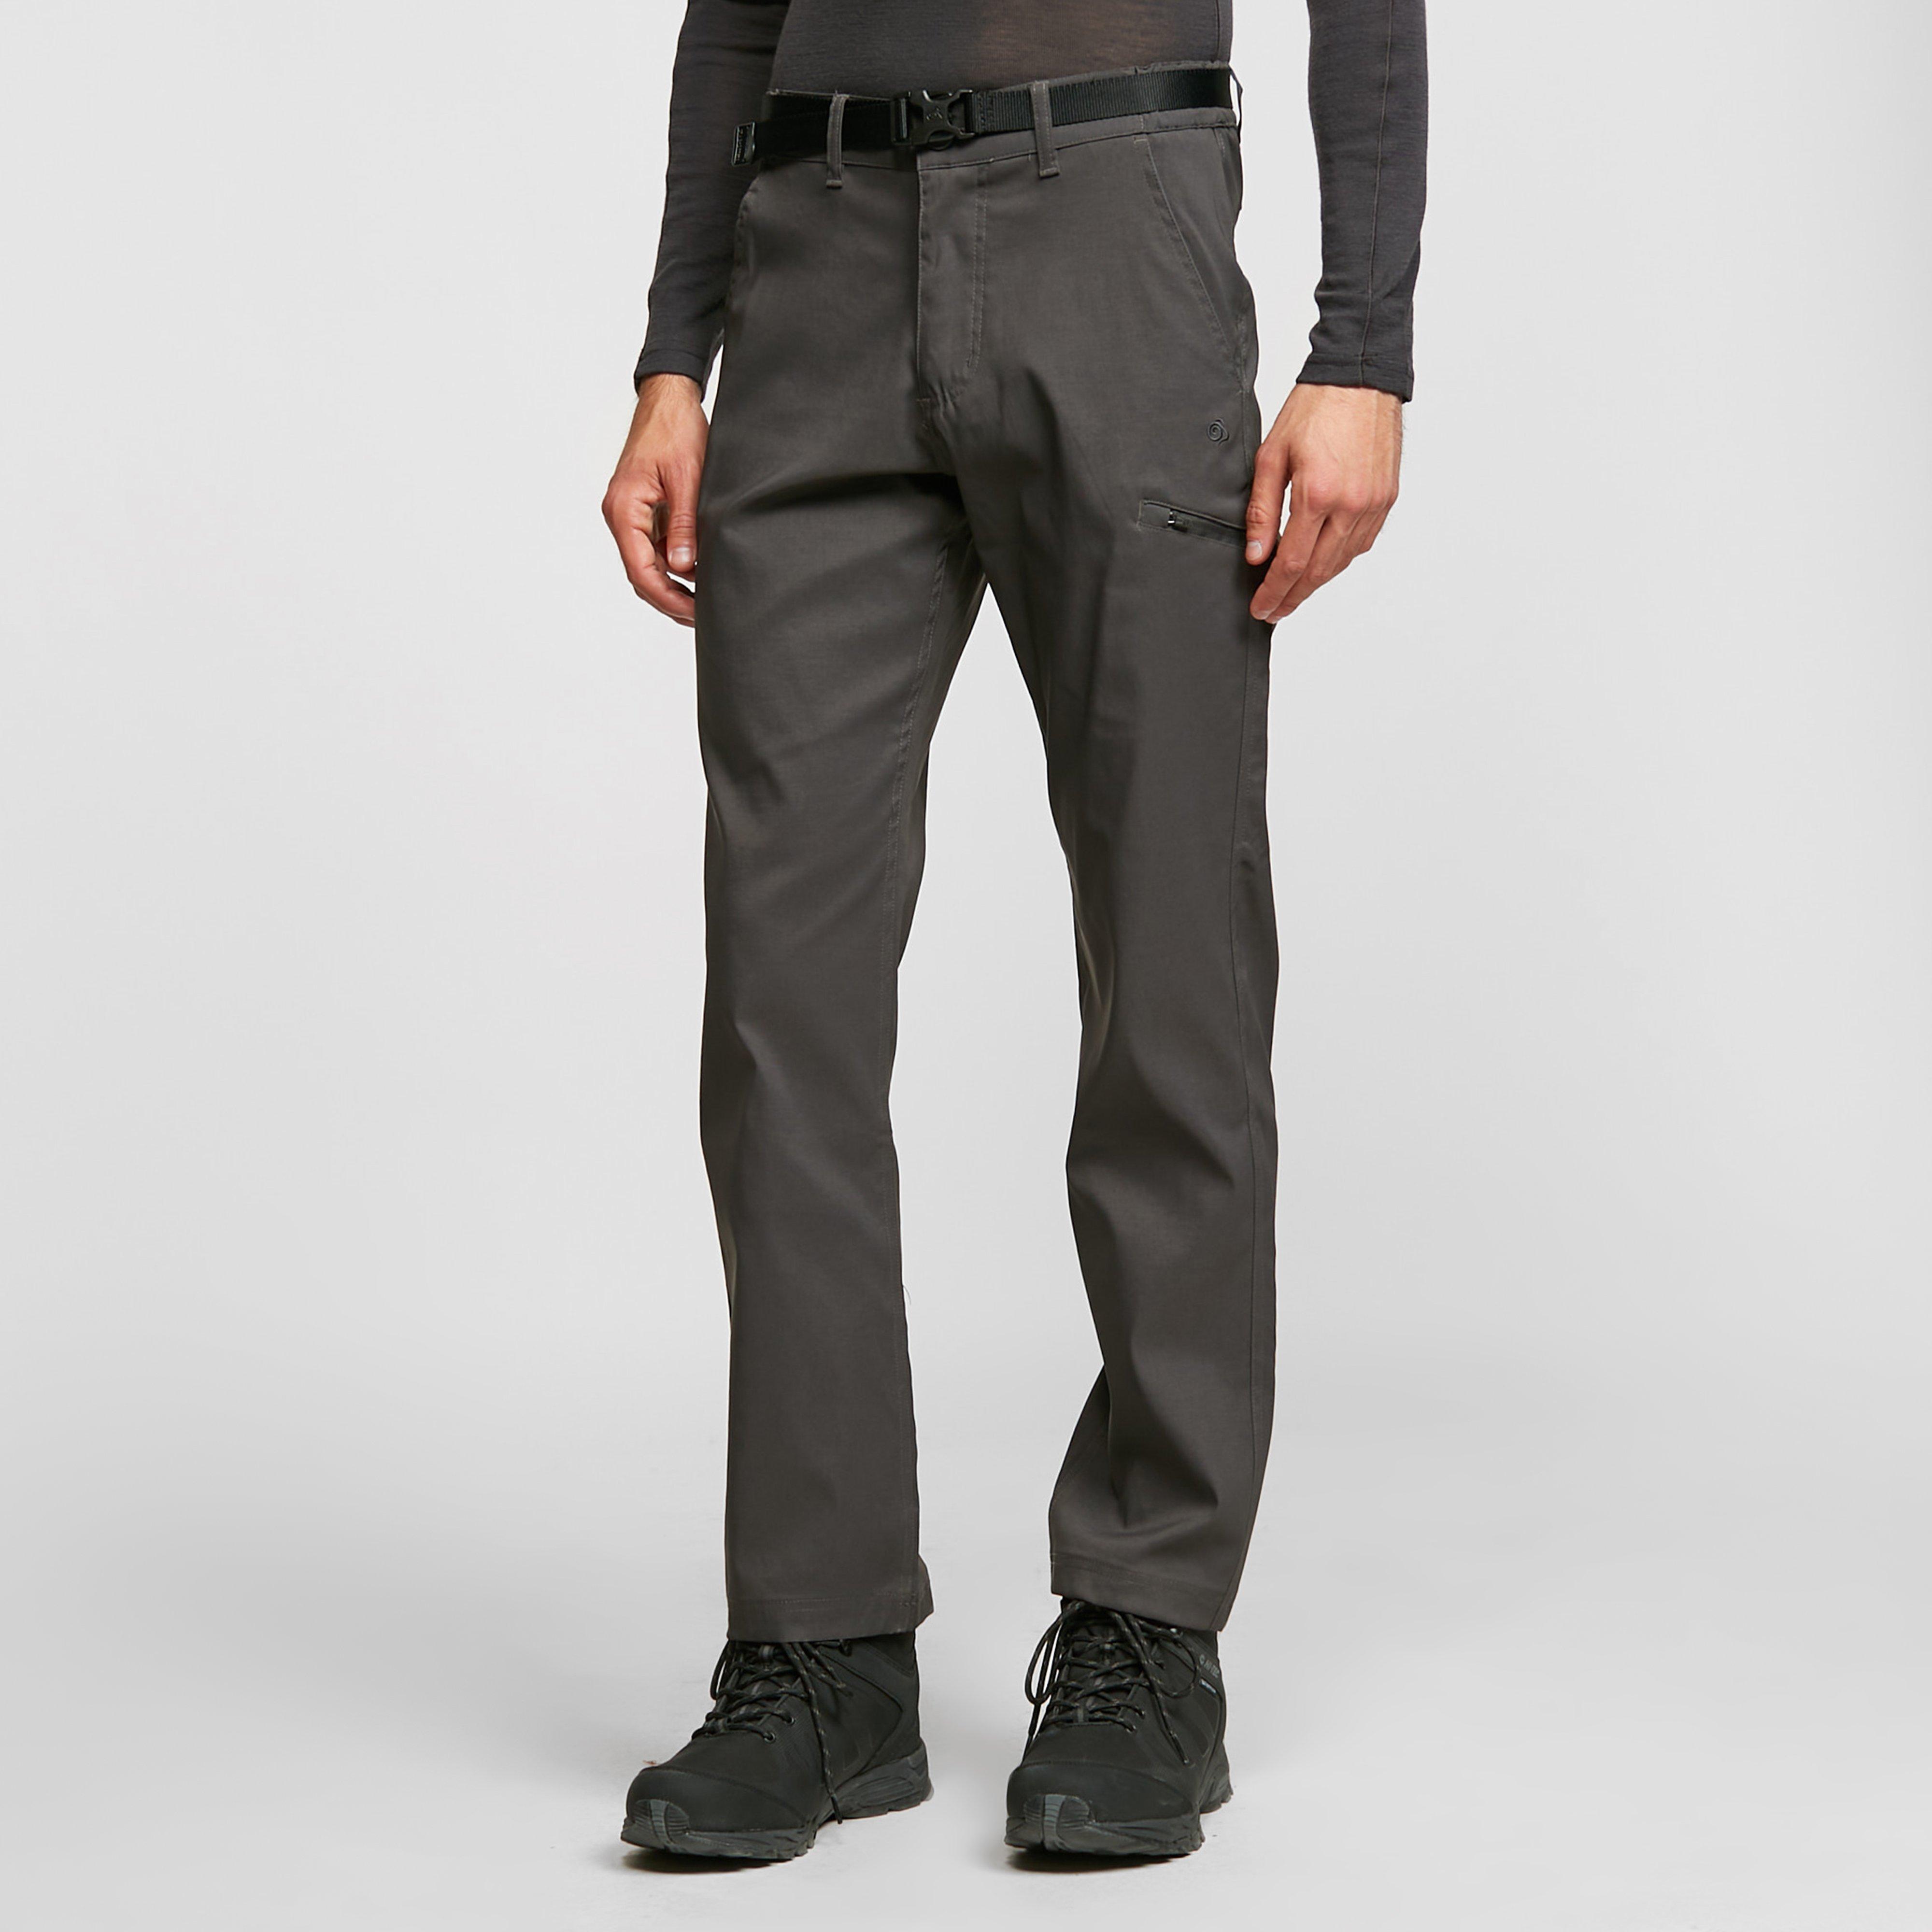 Craghoppers Men's Kiwi Pro Stretch Trousers - Grey, Grey